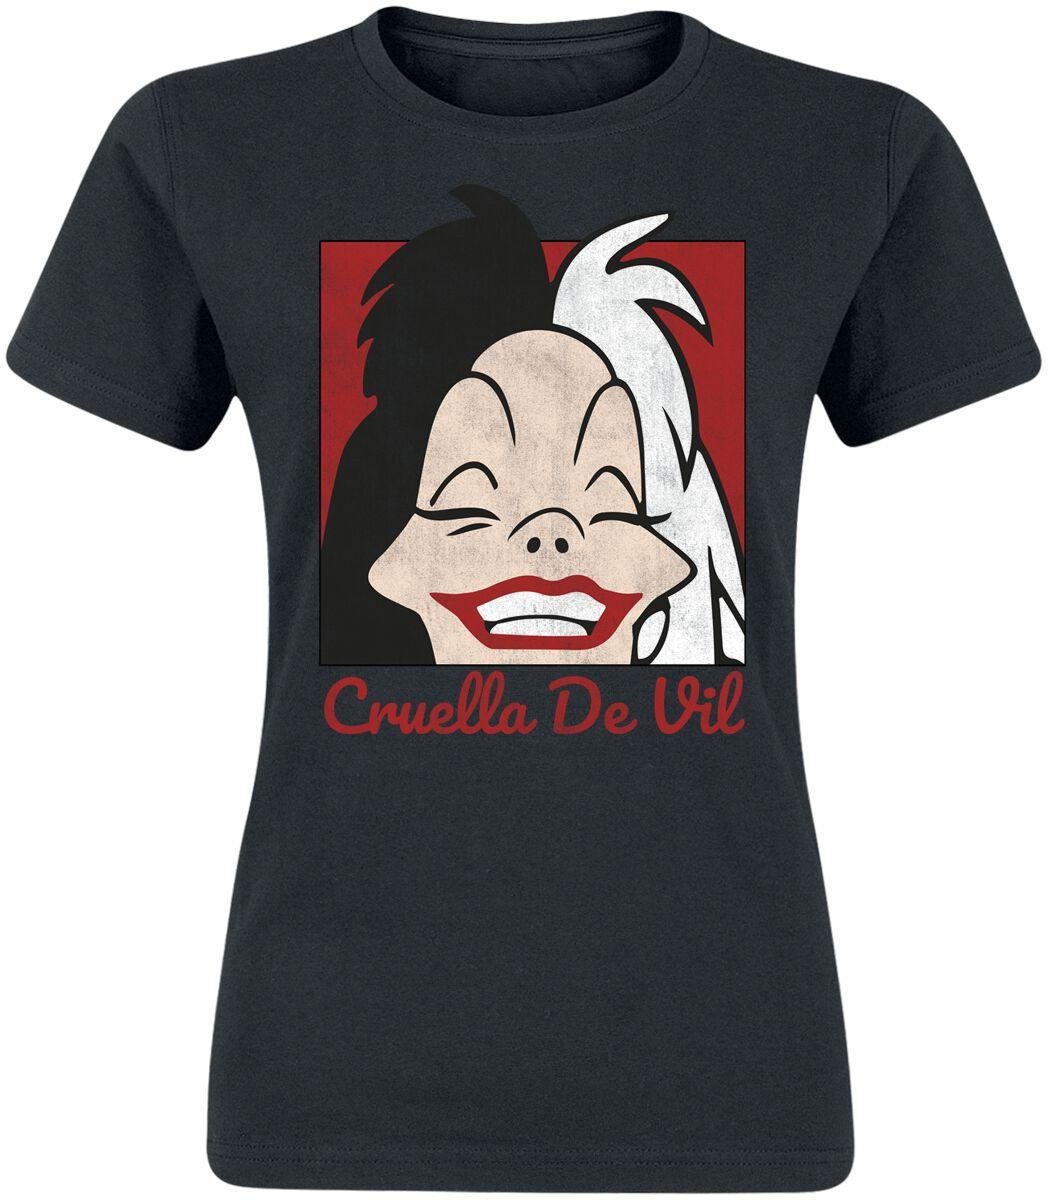 Image of 101 Dalmatiner Cruella De Vil Cropped Head Girl-Shirt schwarz